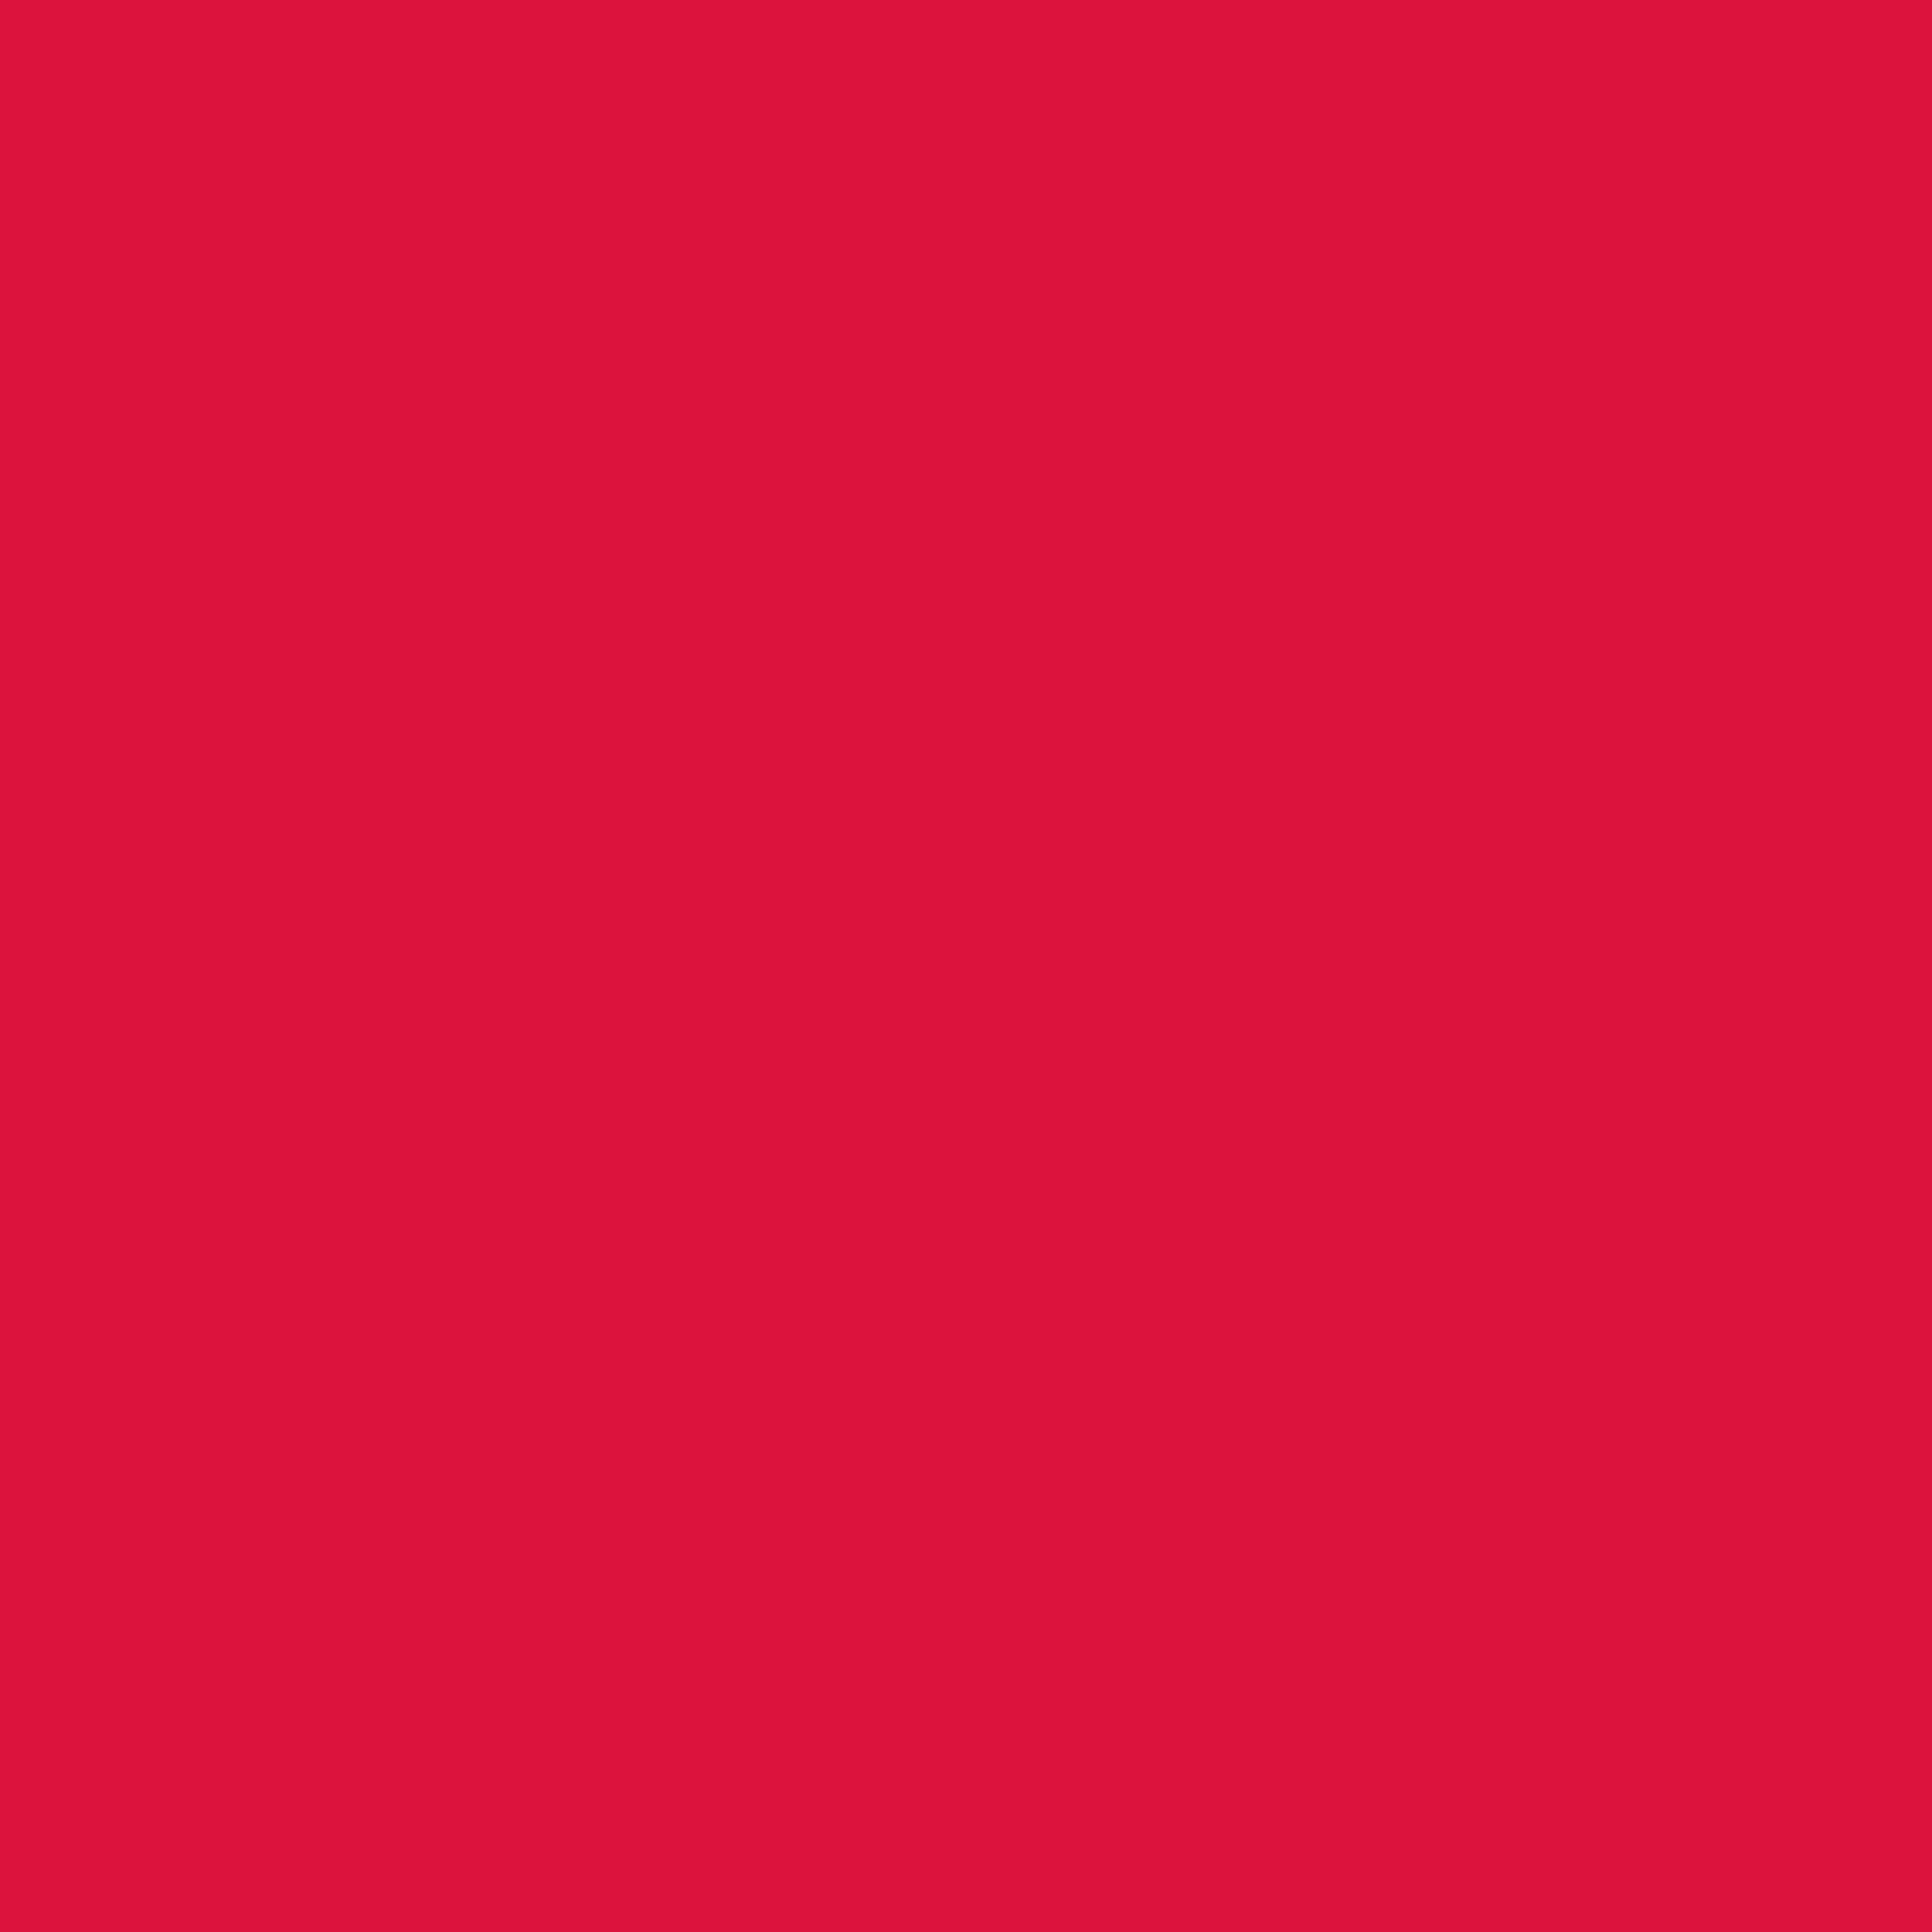 3600x3600 Crimson Solid Color Background